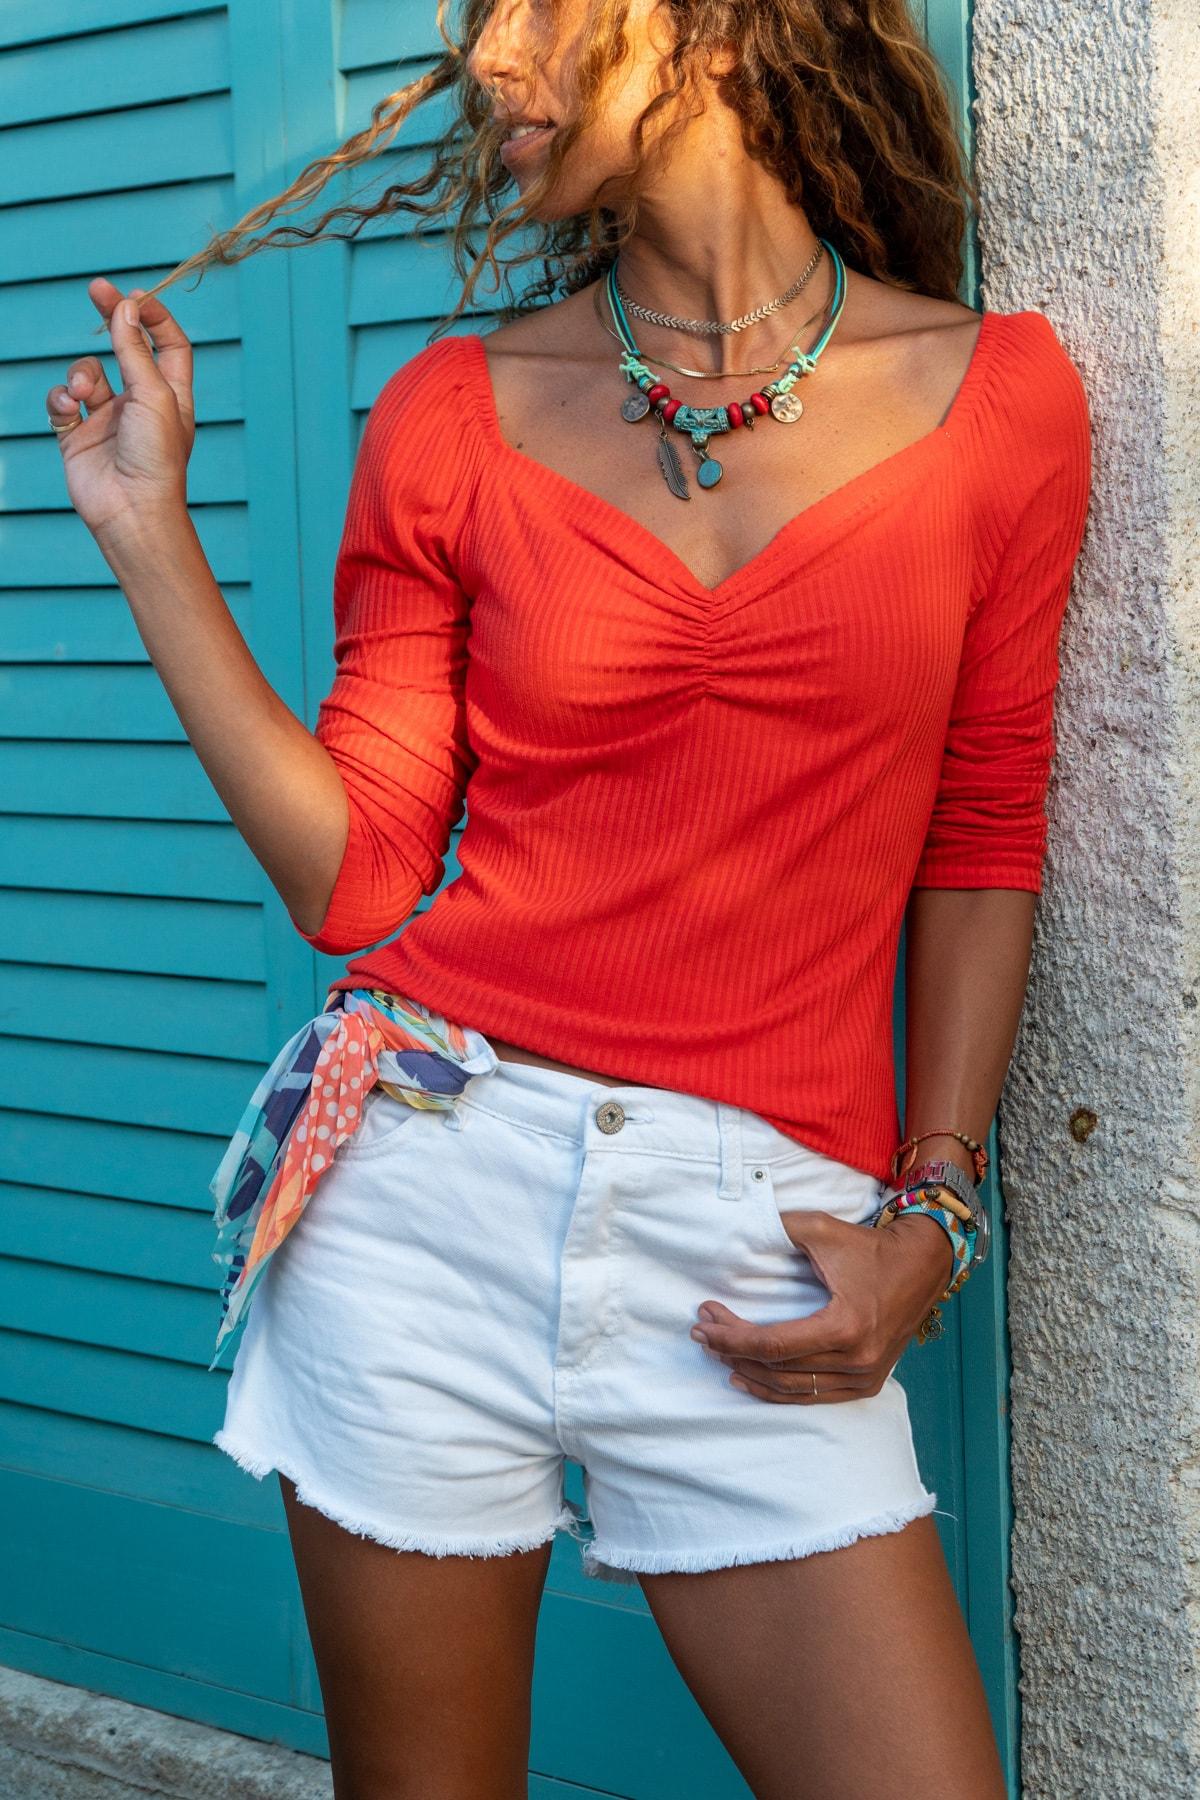 Güneşkızı Kadın Mercan Öpücük Yaka Omzu Lastikli Bluz GK-BST2915